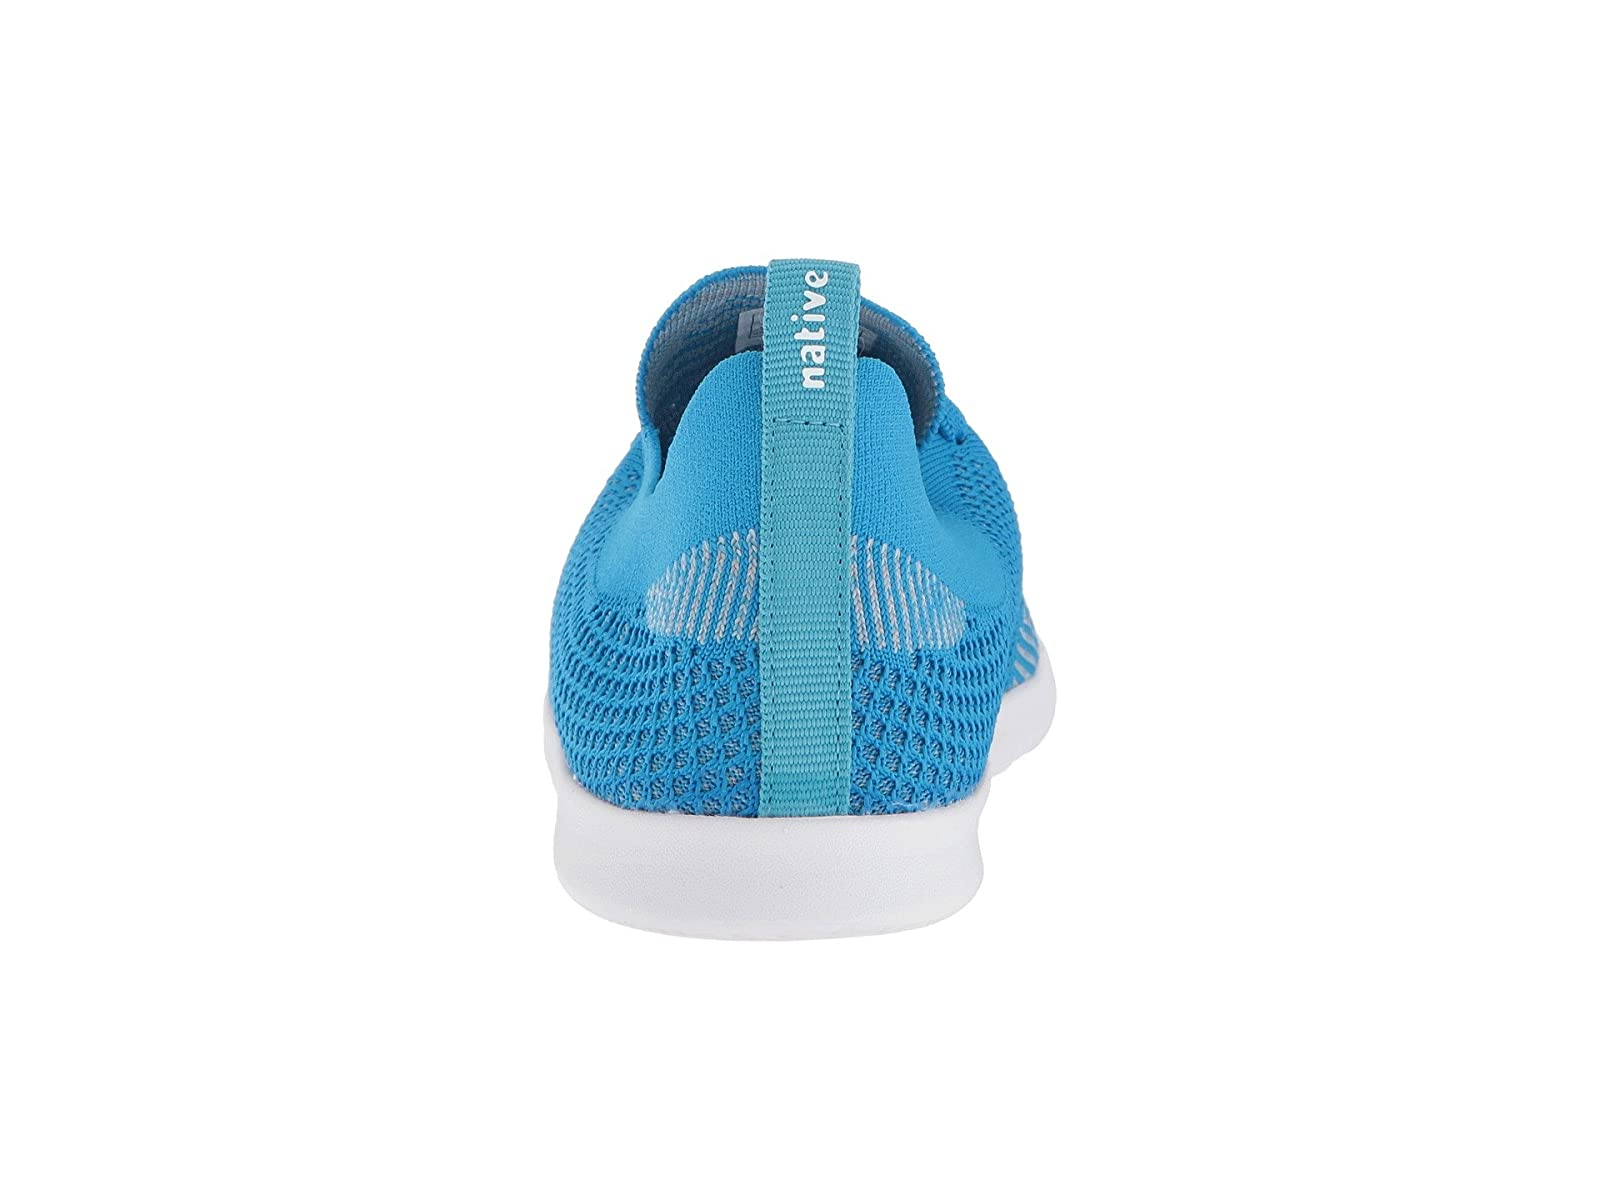 Native Kids Shoes AP Kid/Big Mercury Liteknit (Little Kid/Big AP Kid) cb310e